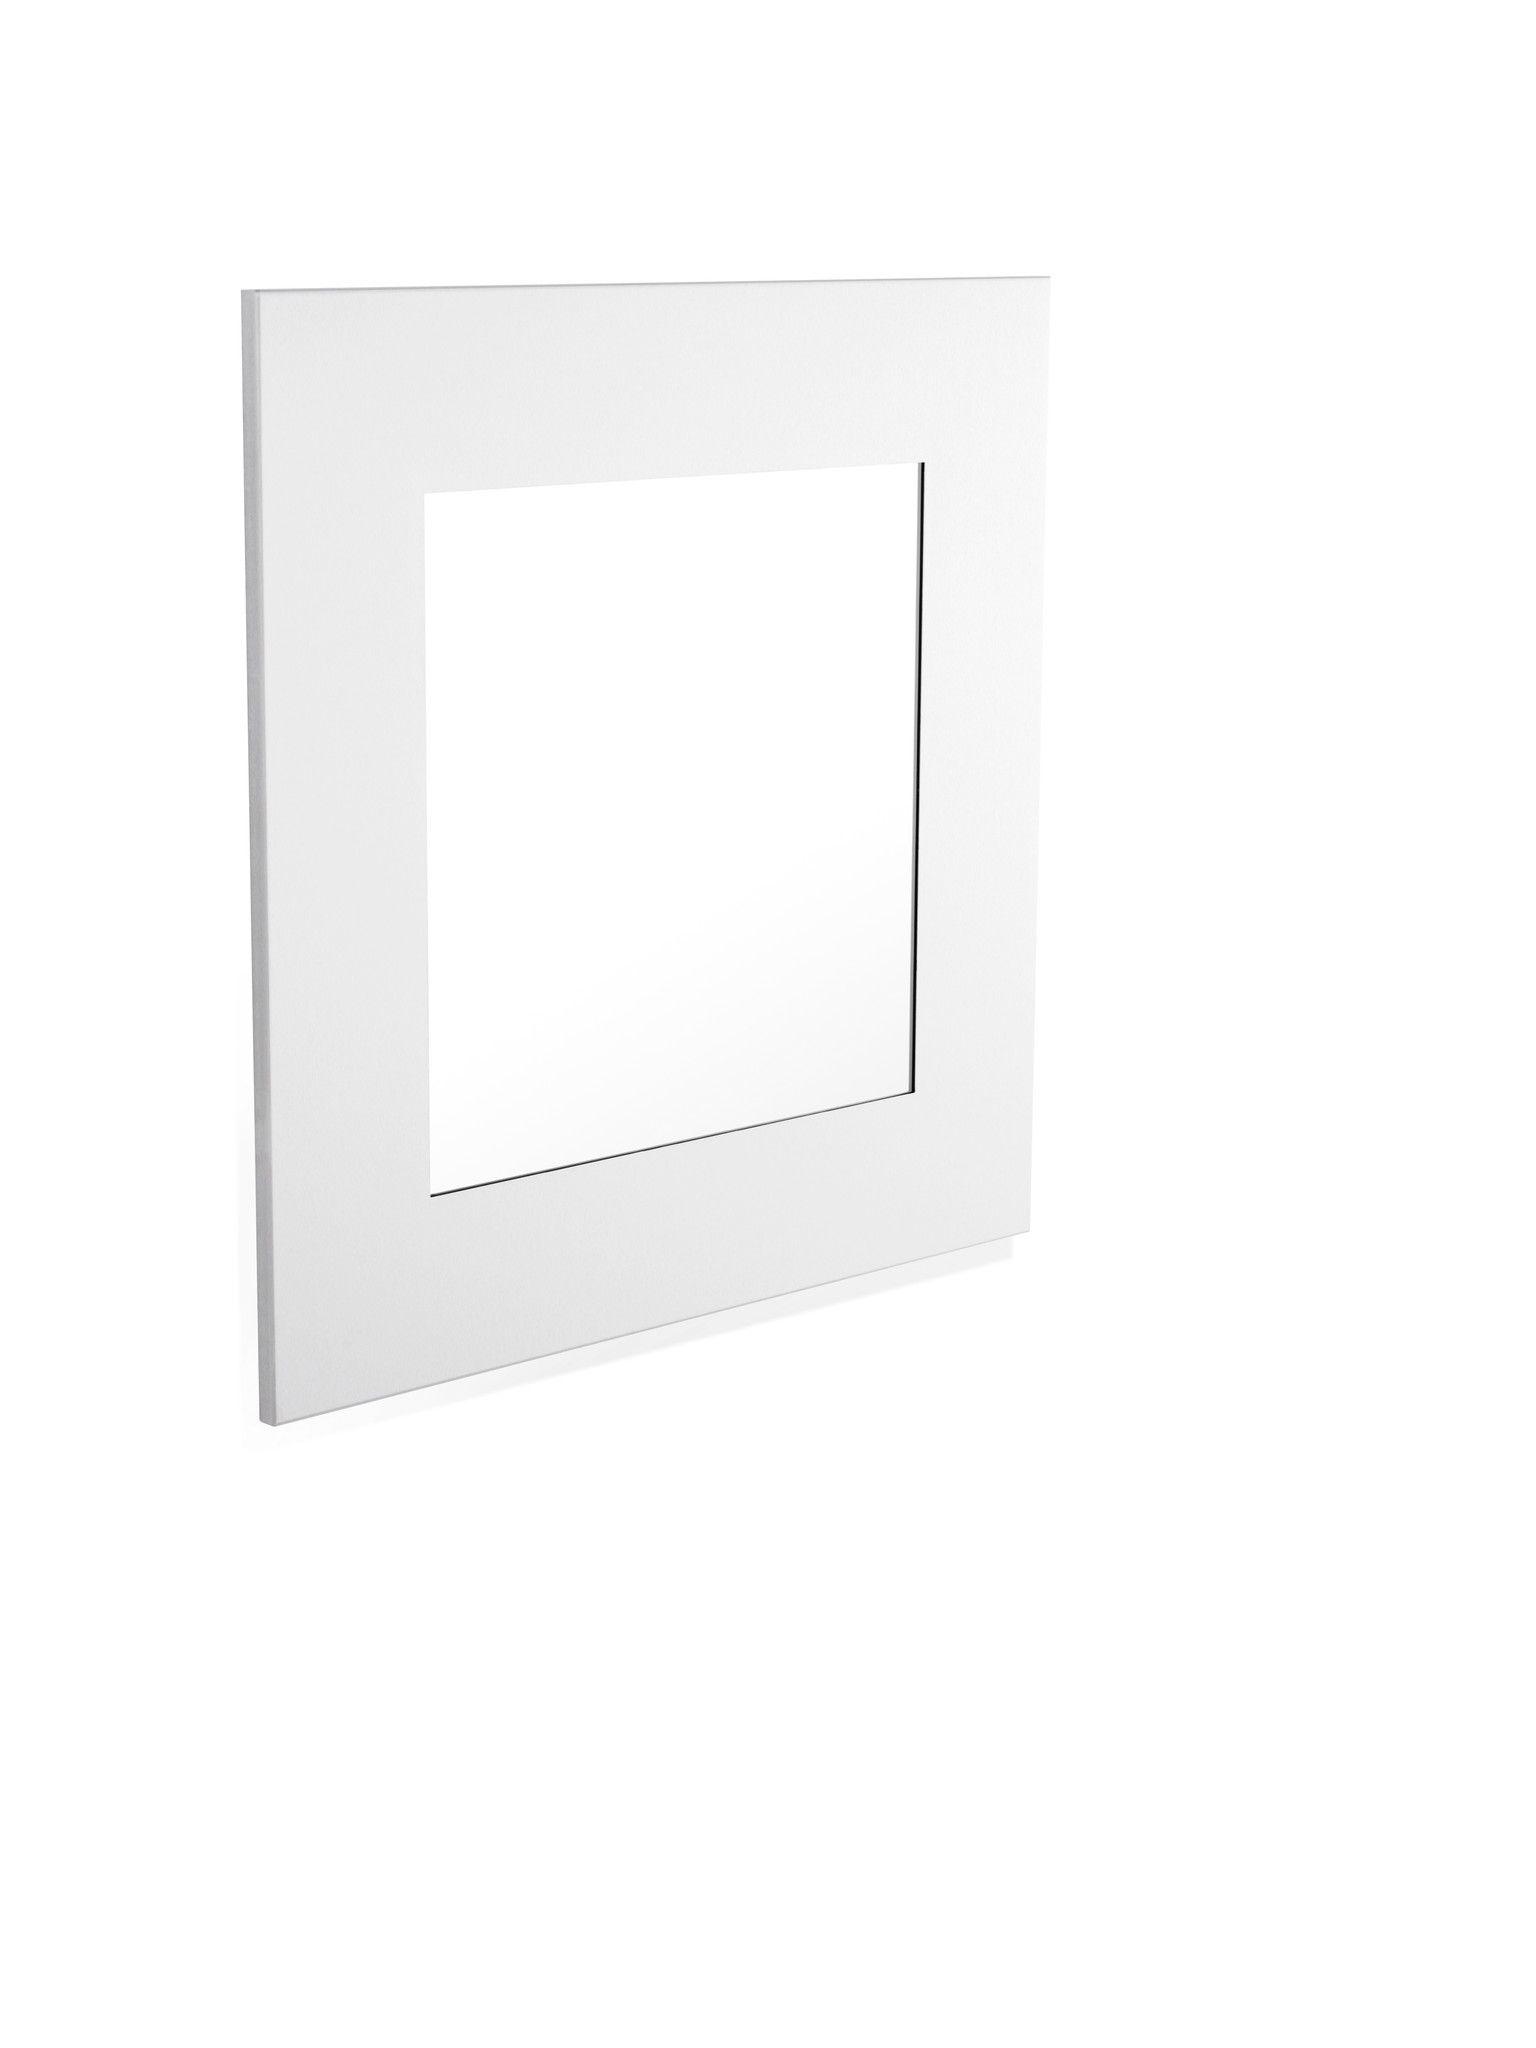 Mirror 21 3/4 x 21 3/4 Inches